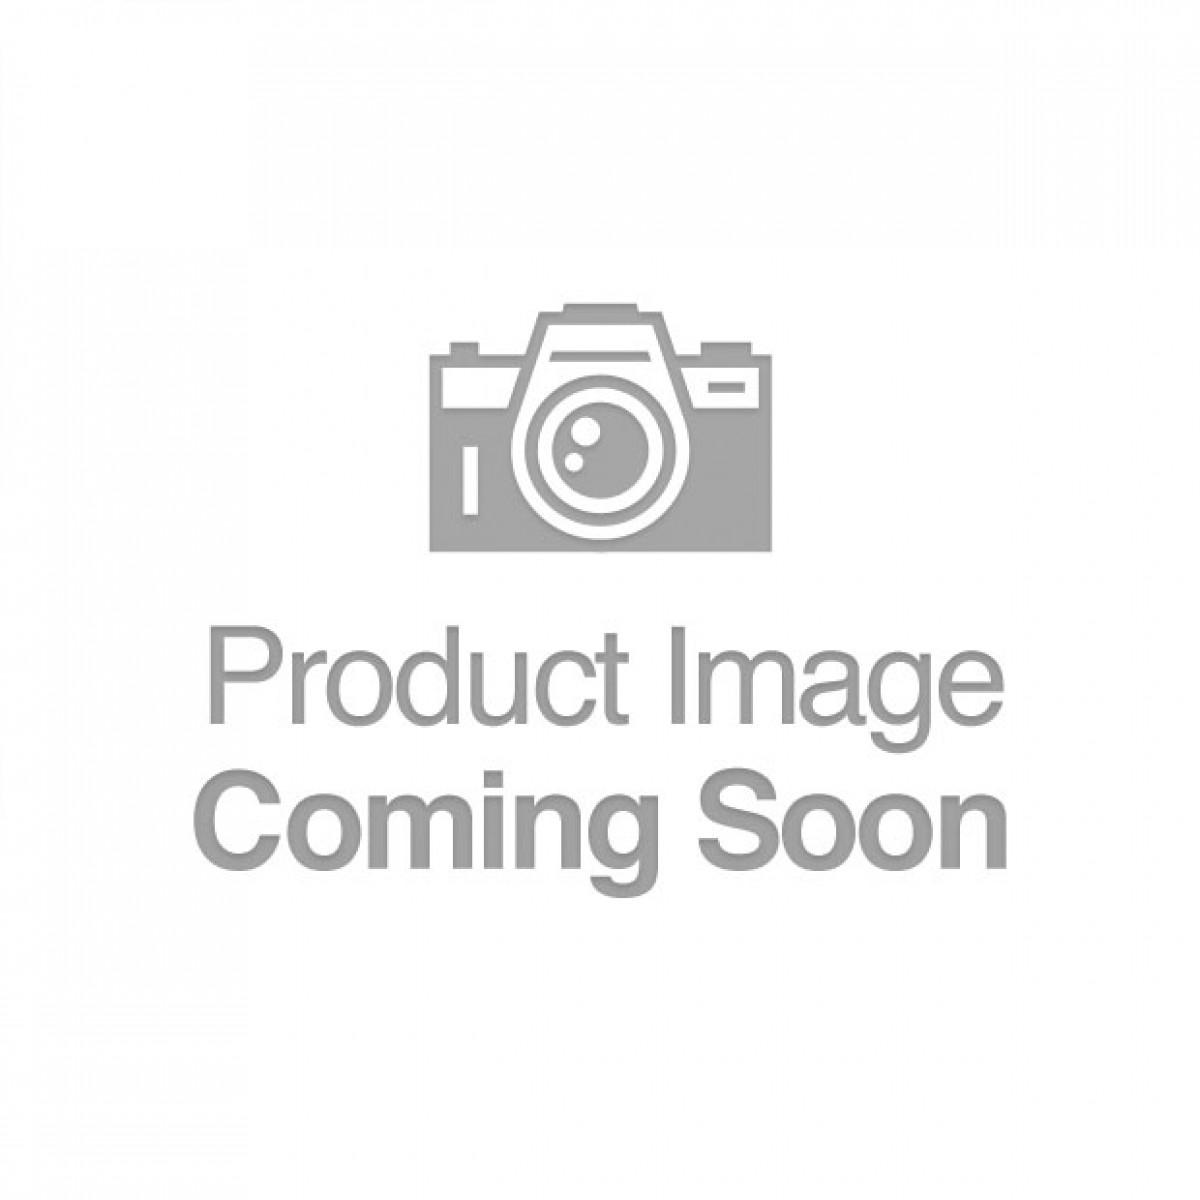 Durex XXL Condoms - Pack of 12